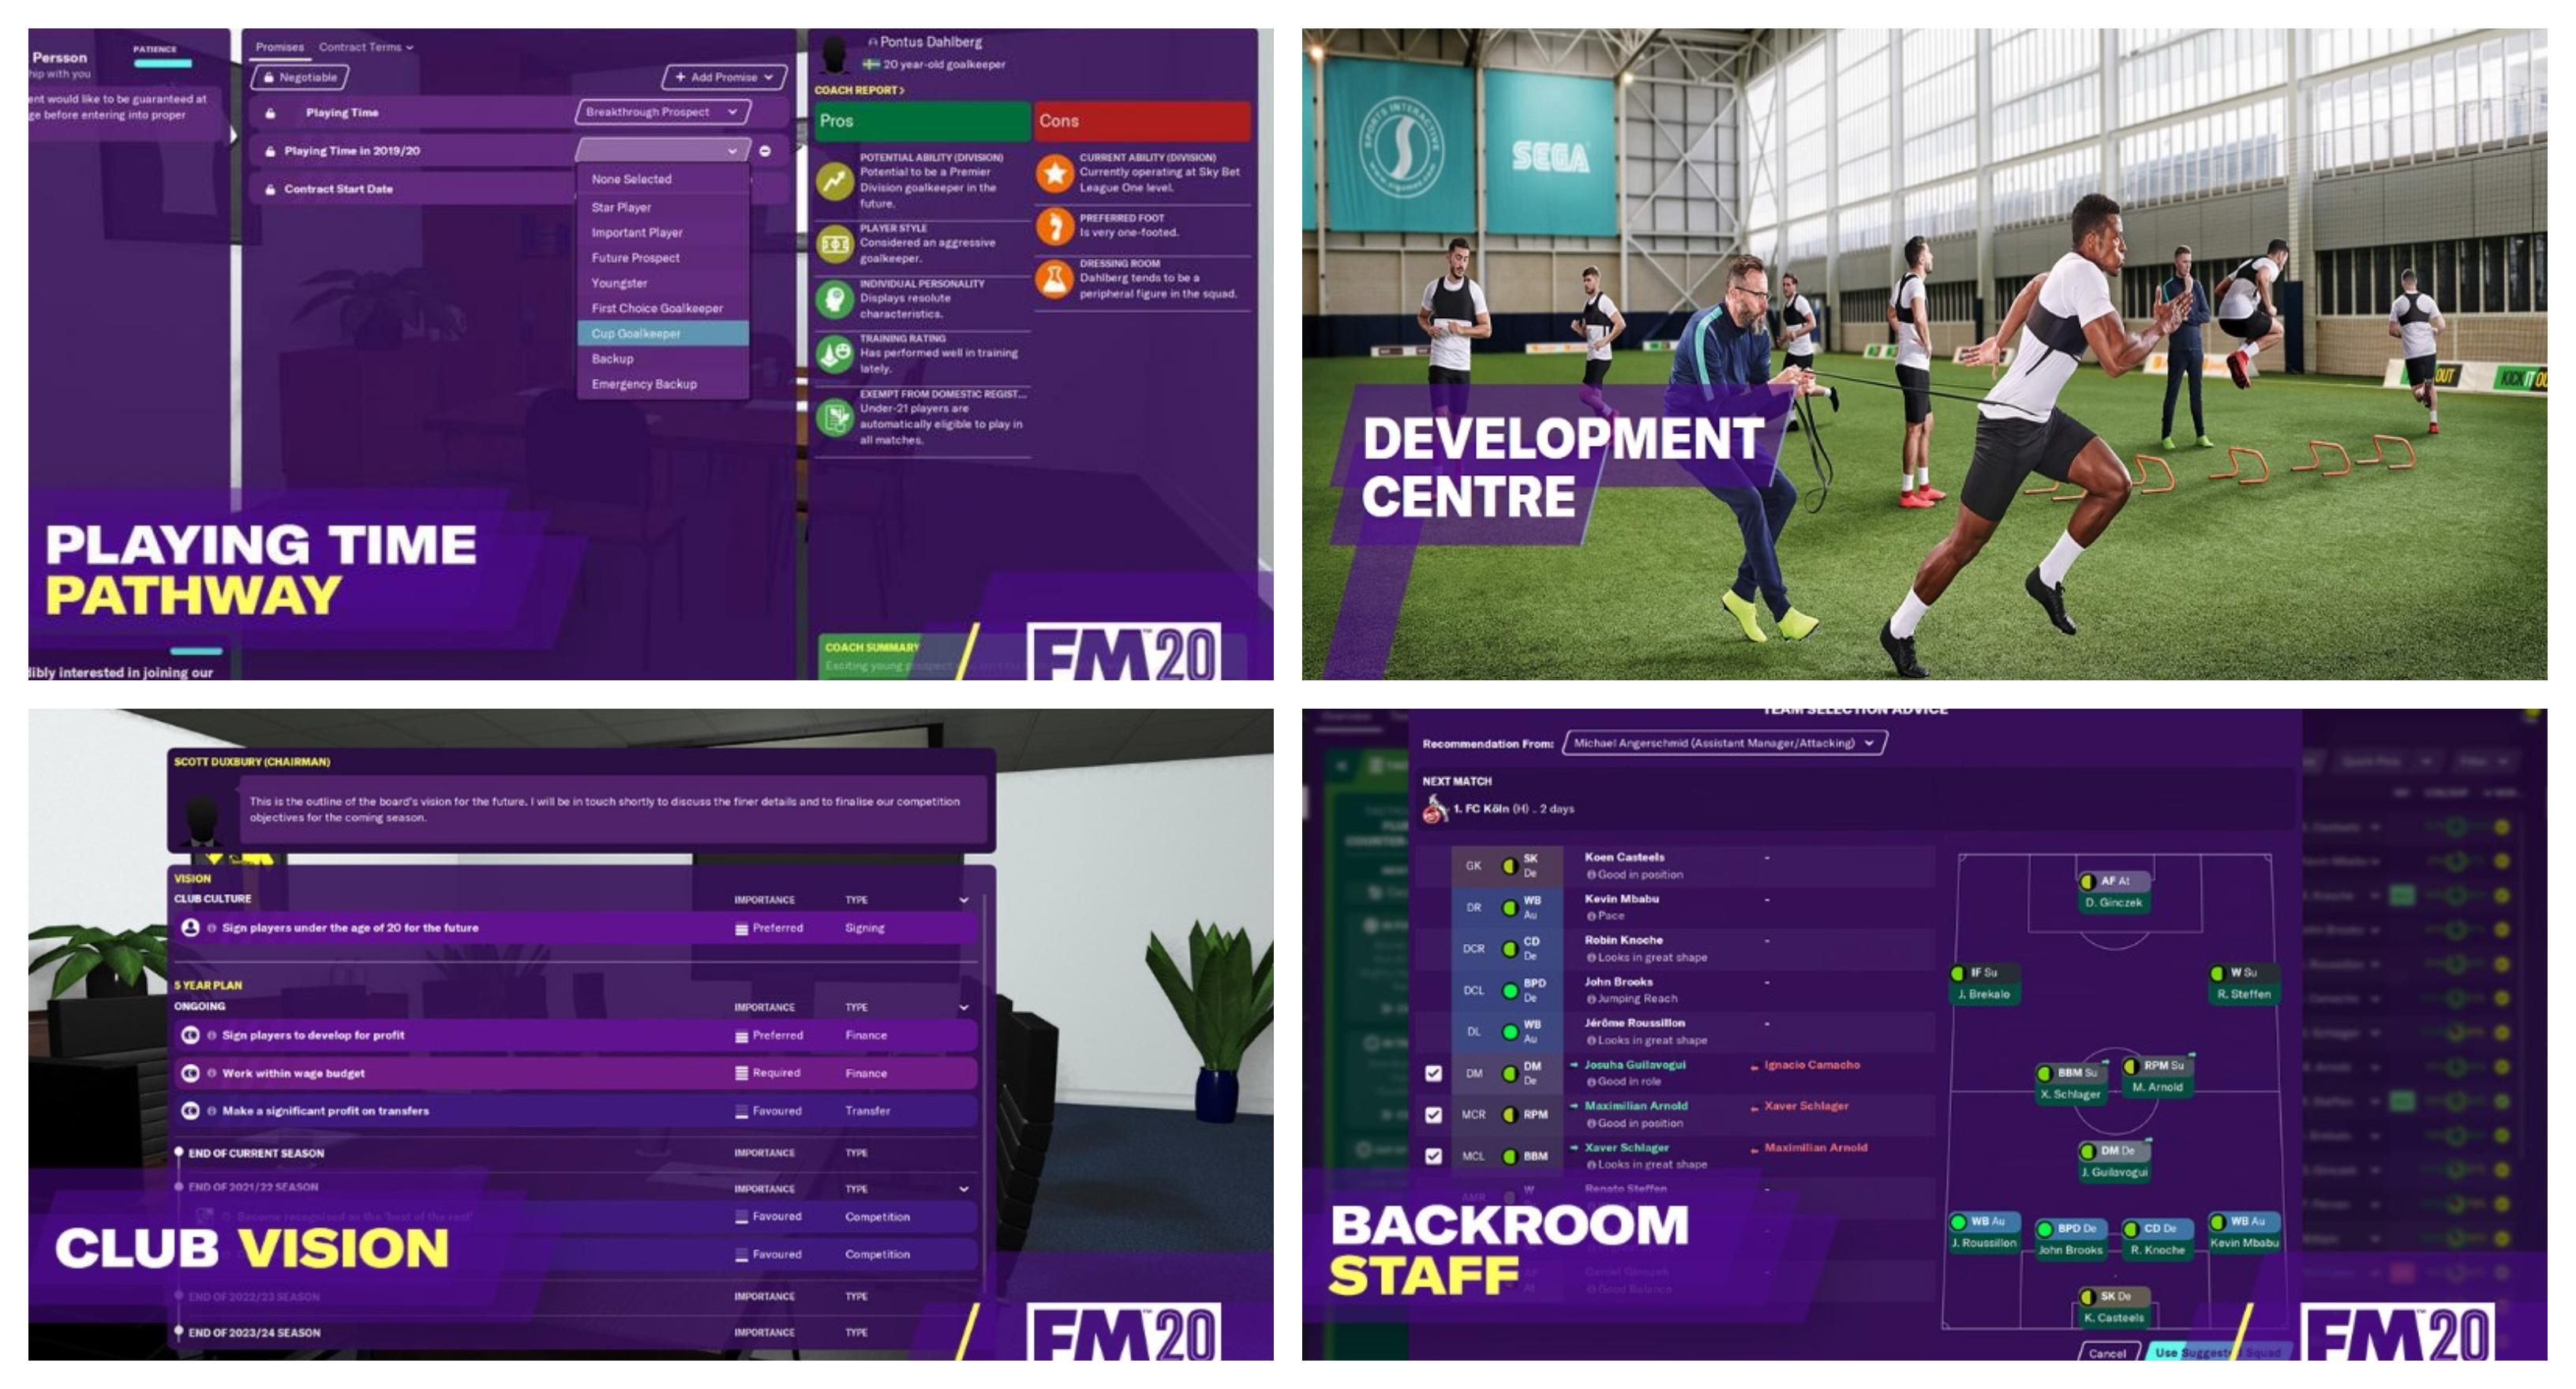 Football Manager 2020: Ανάλυση των αλλαγών του παιχνιδιού